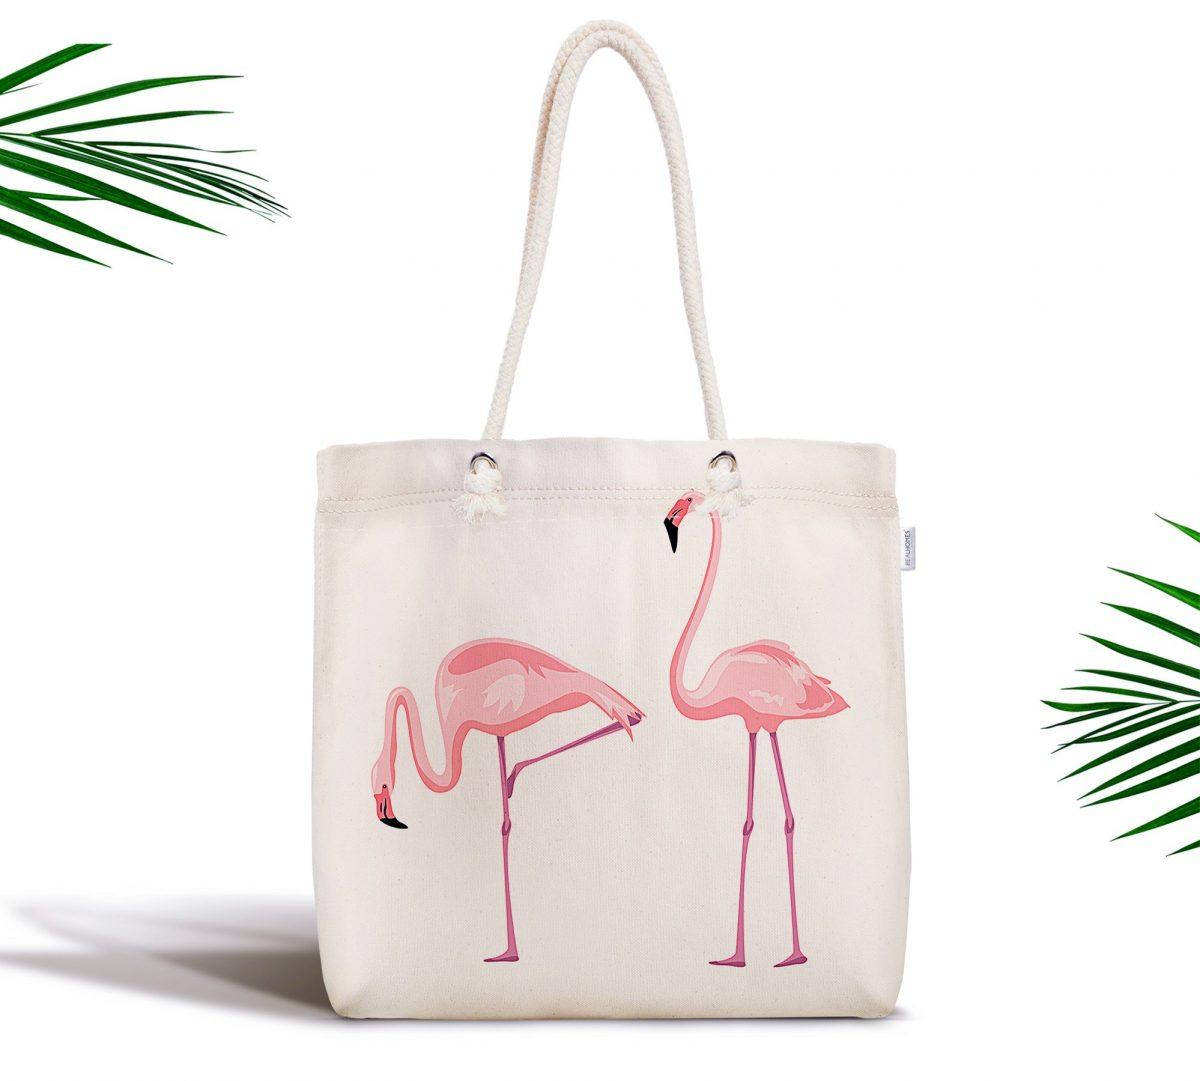 Pembe Flamingo Desenli Dijital Baskılı Fermuarlı Kumaş Çanta Realhomes